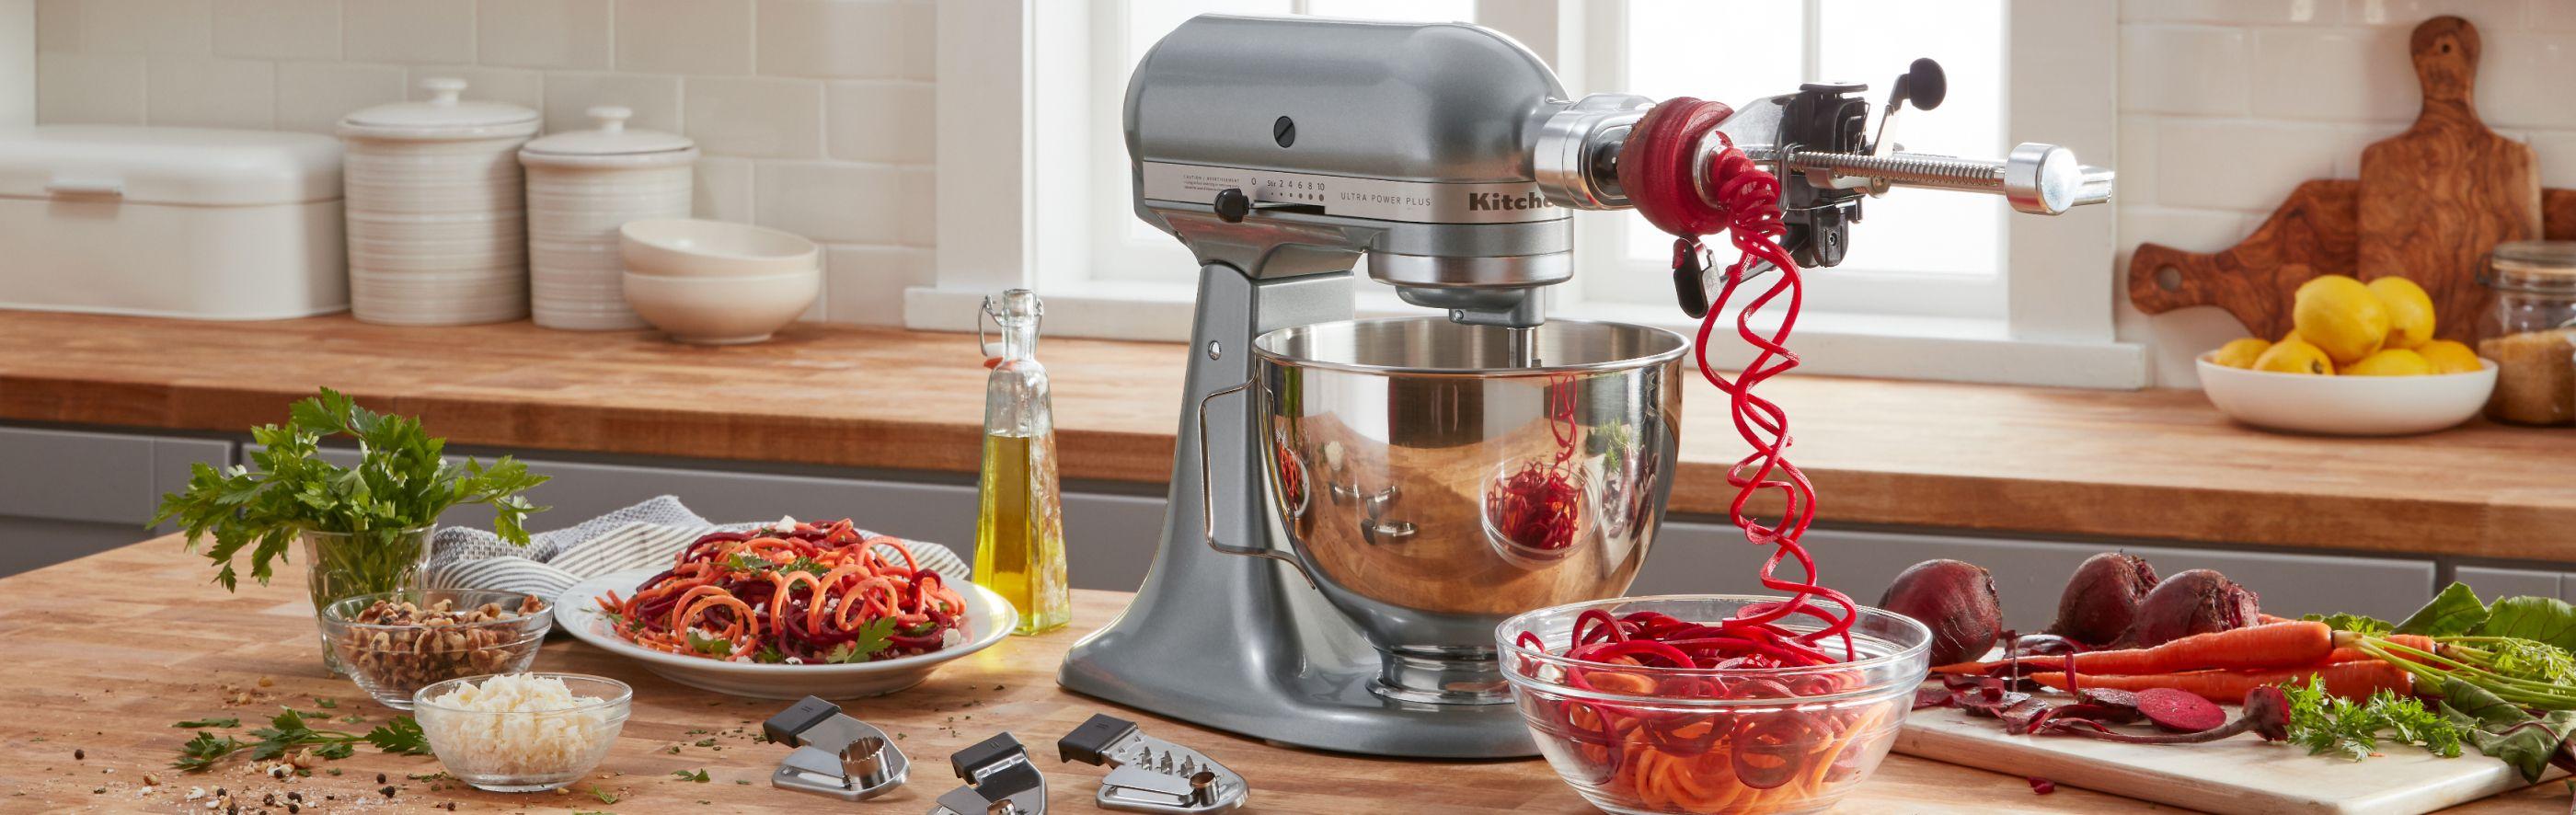 KitchenAid® Stand Mixer w/attachment making beet noodles.